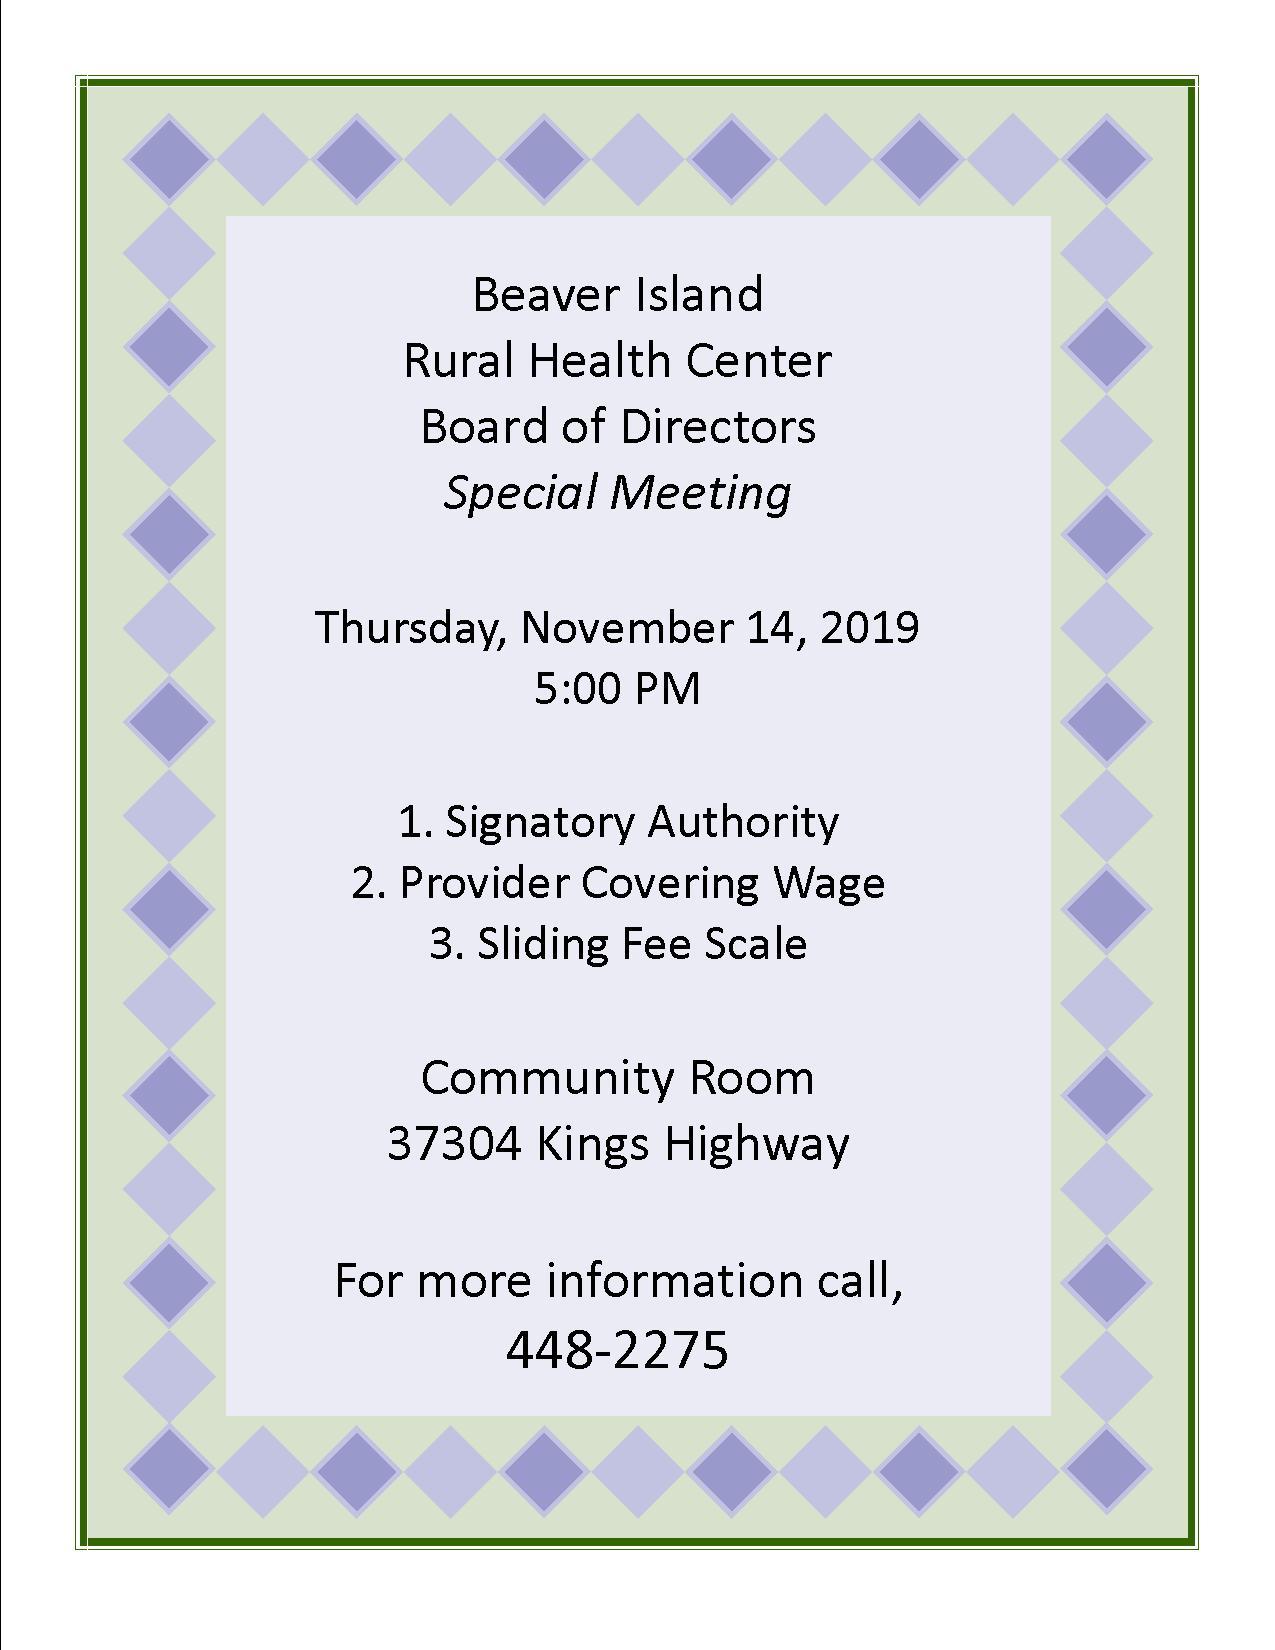 BIRHC Special Board Meeting @ Beaver Island Rural Health Center